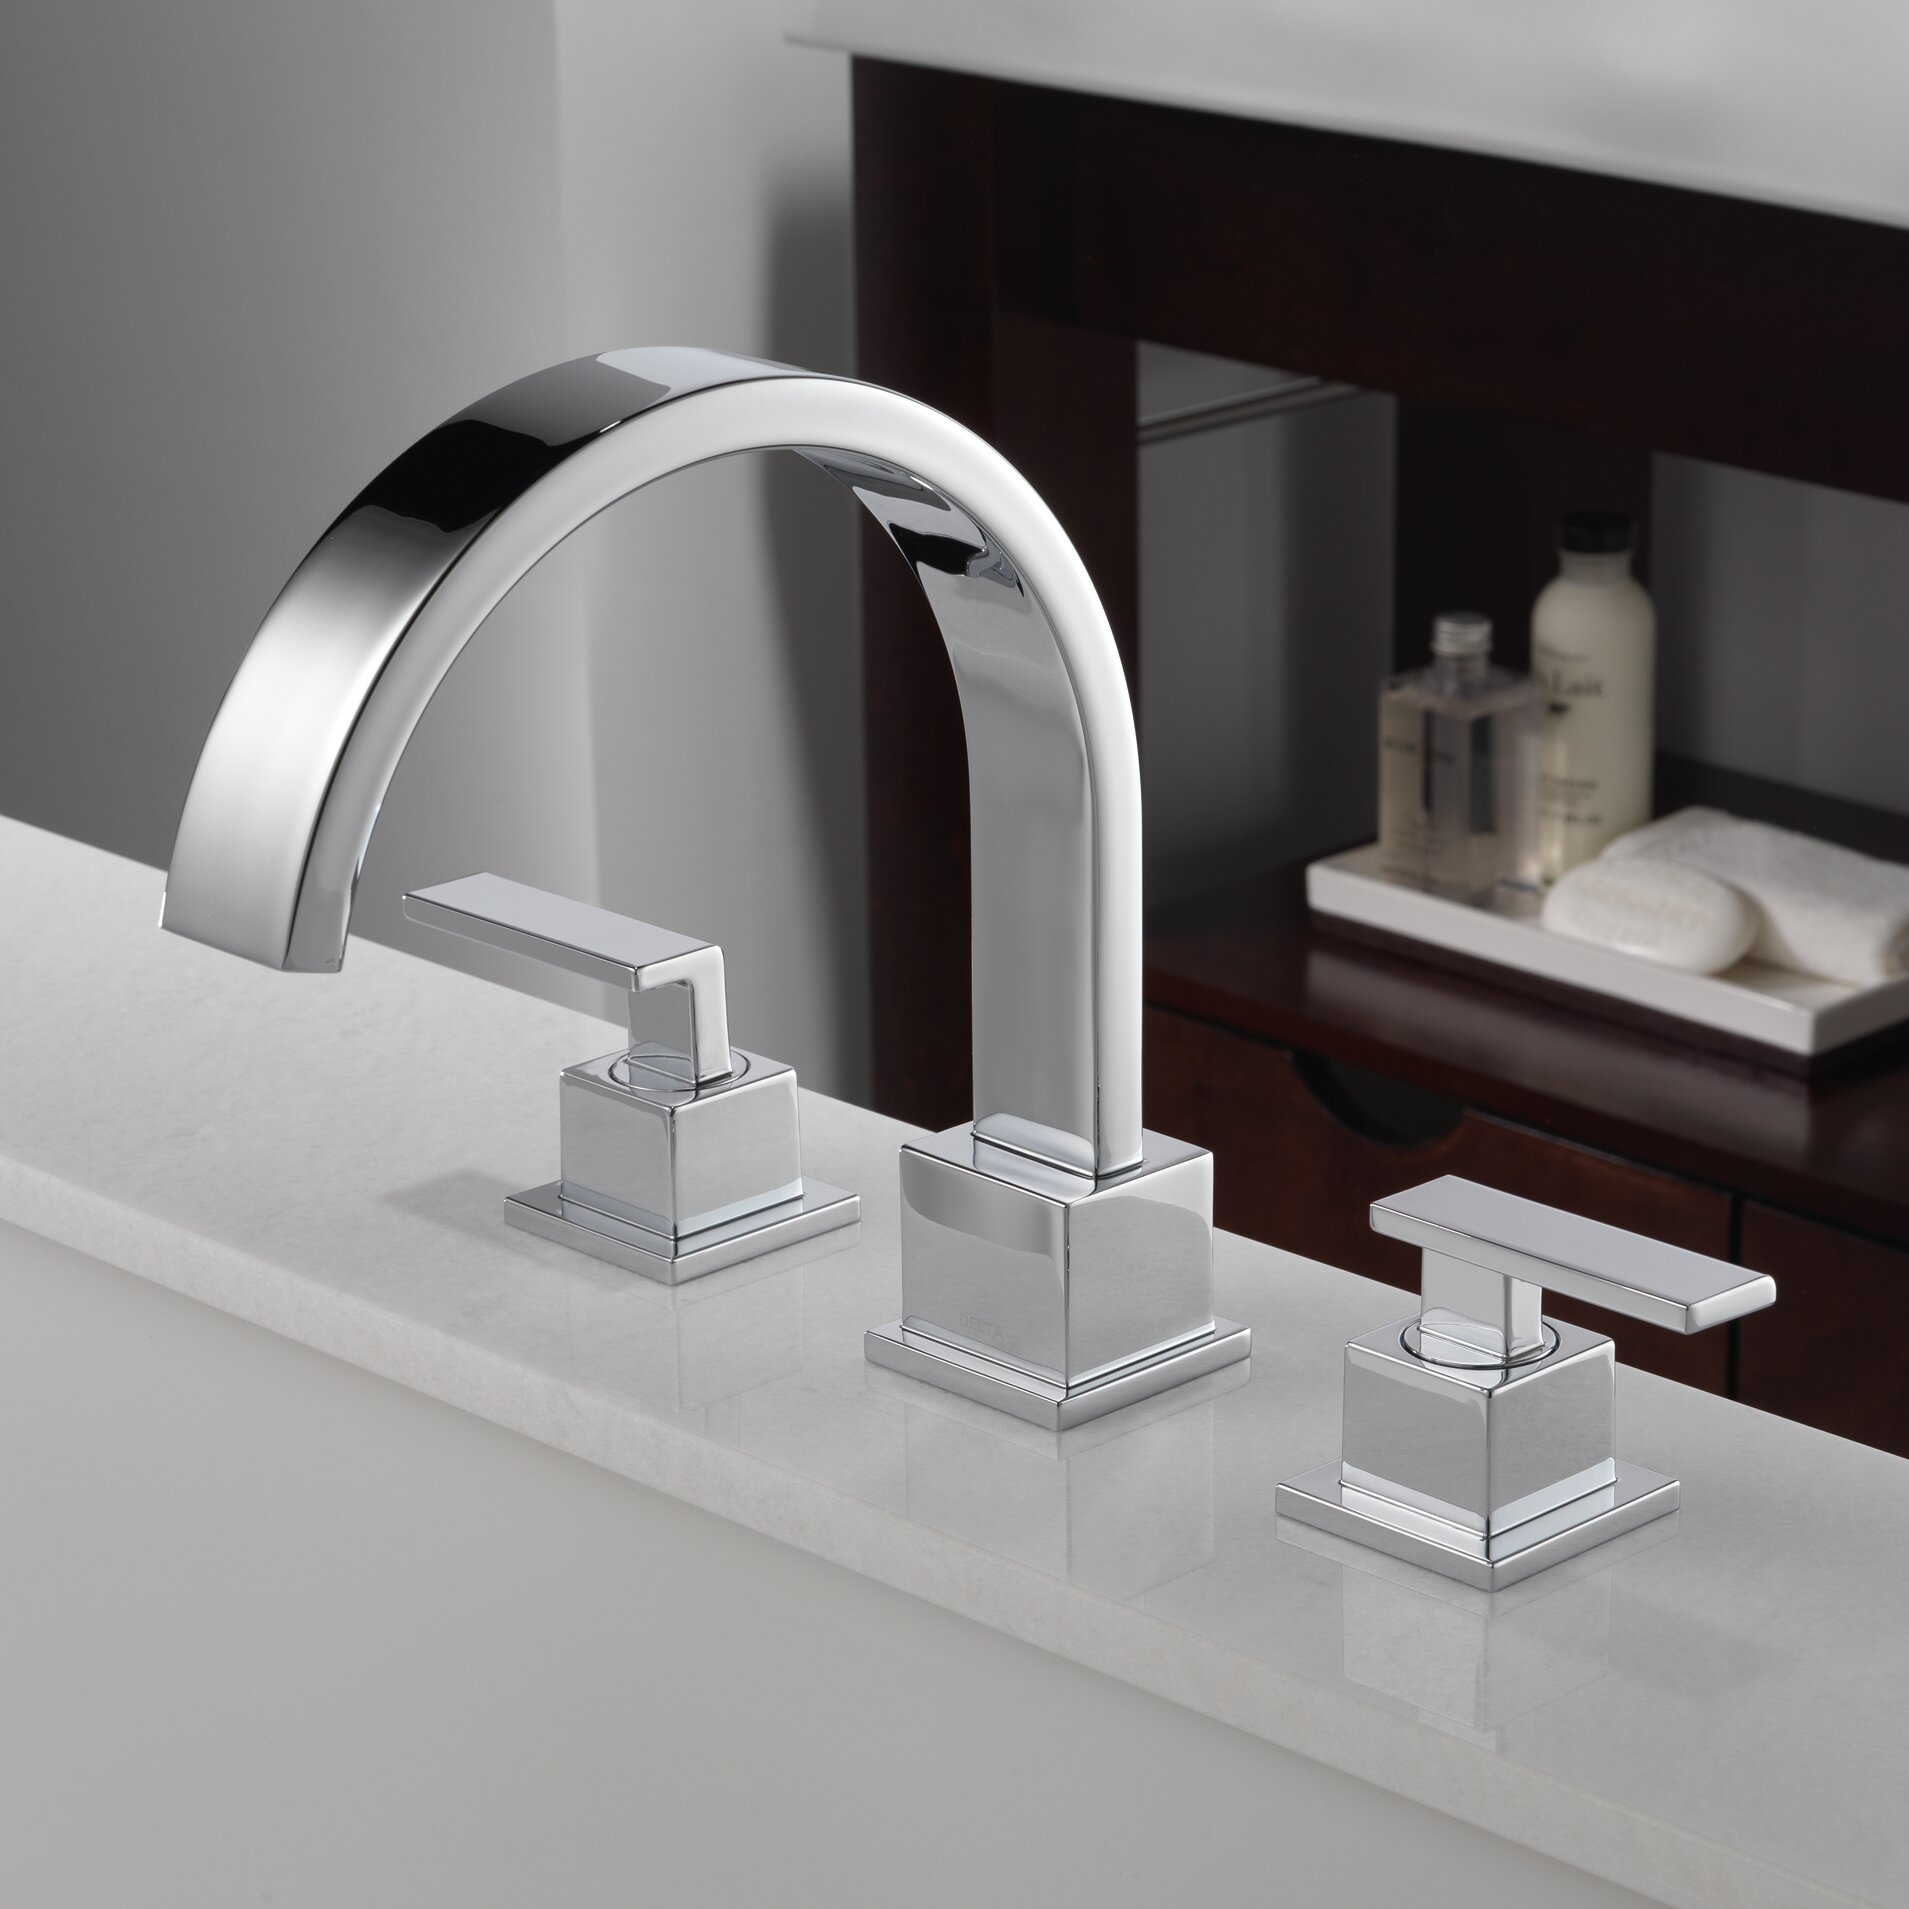 5 Hole Roman Tub Faucet Delta. roman tub faucet with hand shower 5 ...